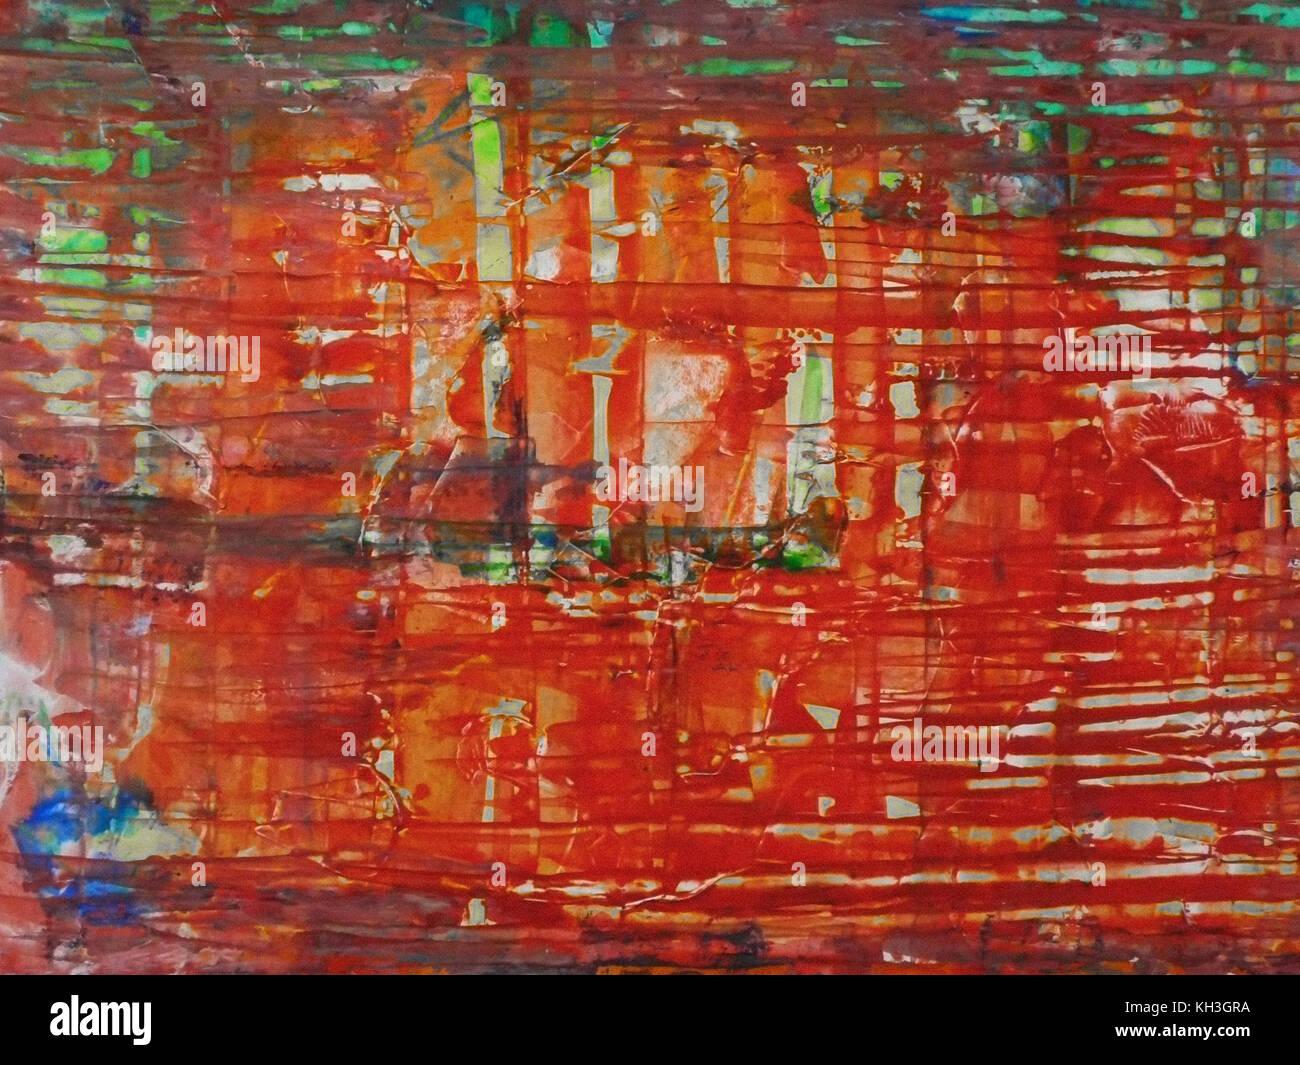 Abstrakte Kunst Leinwand malerei mit acryl auf leinwand abstrakte kunst hintergrund für